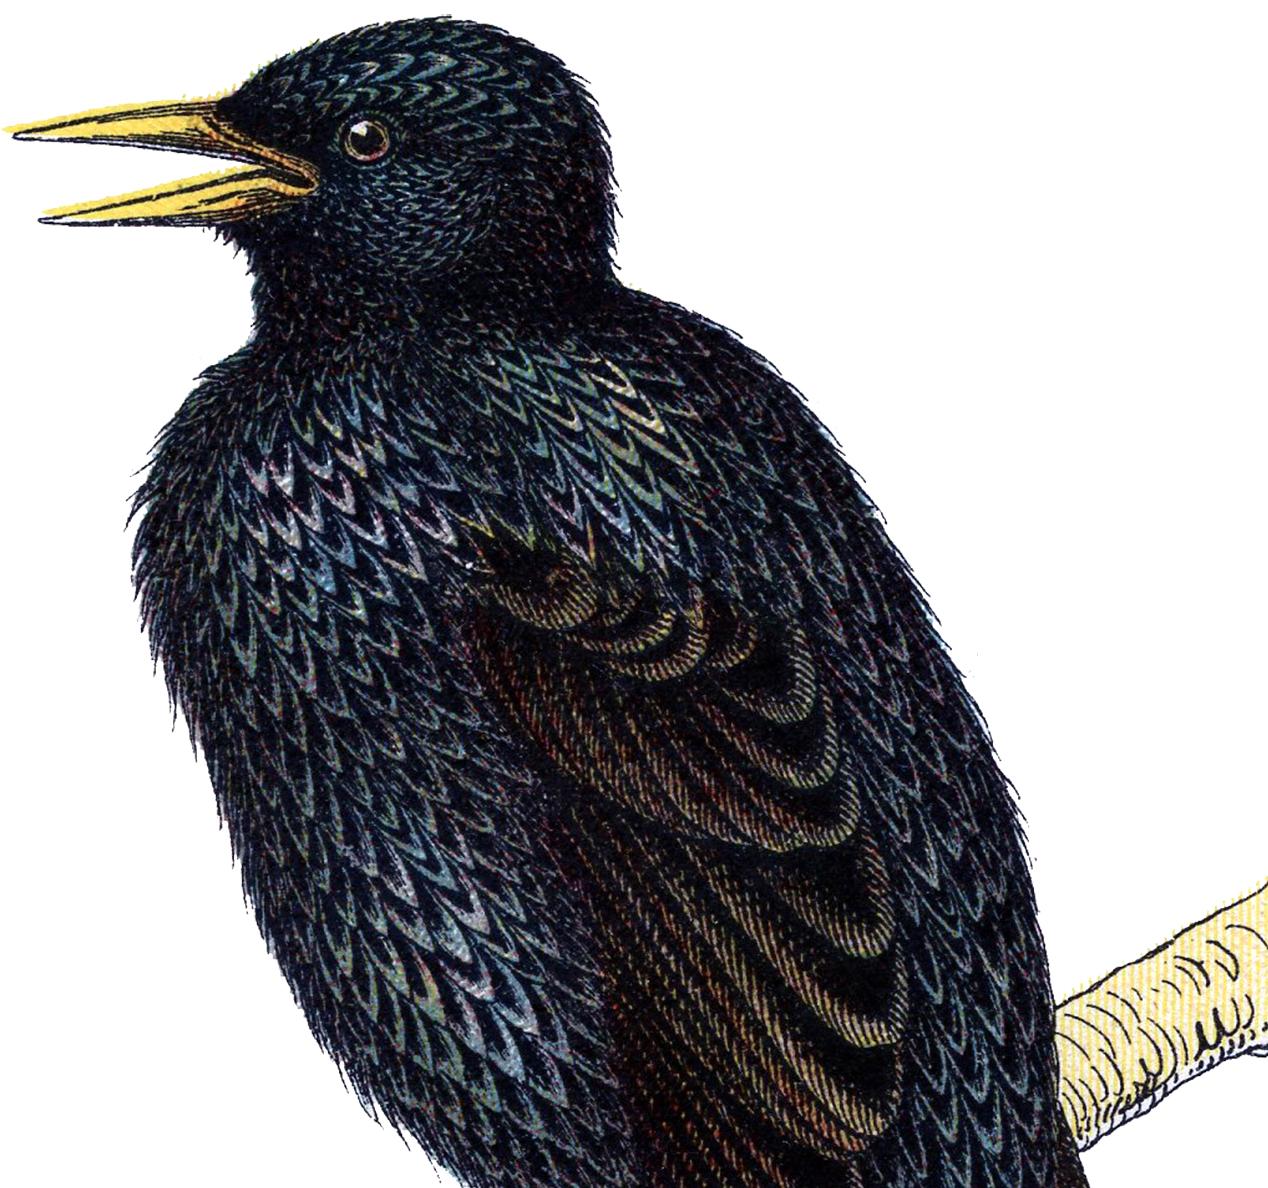 Wonderful Vintage Starling Bird Image!.